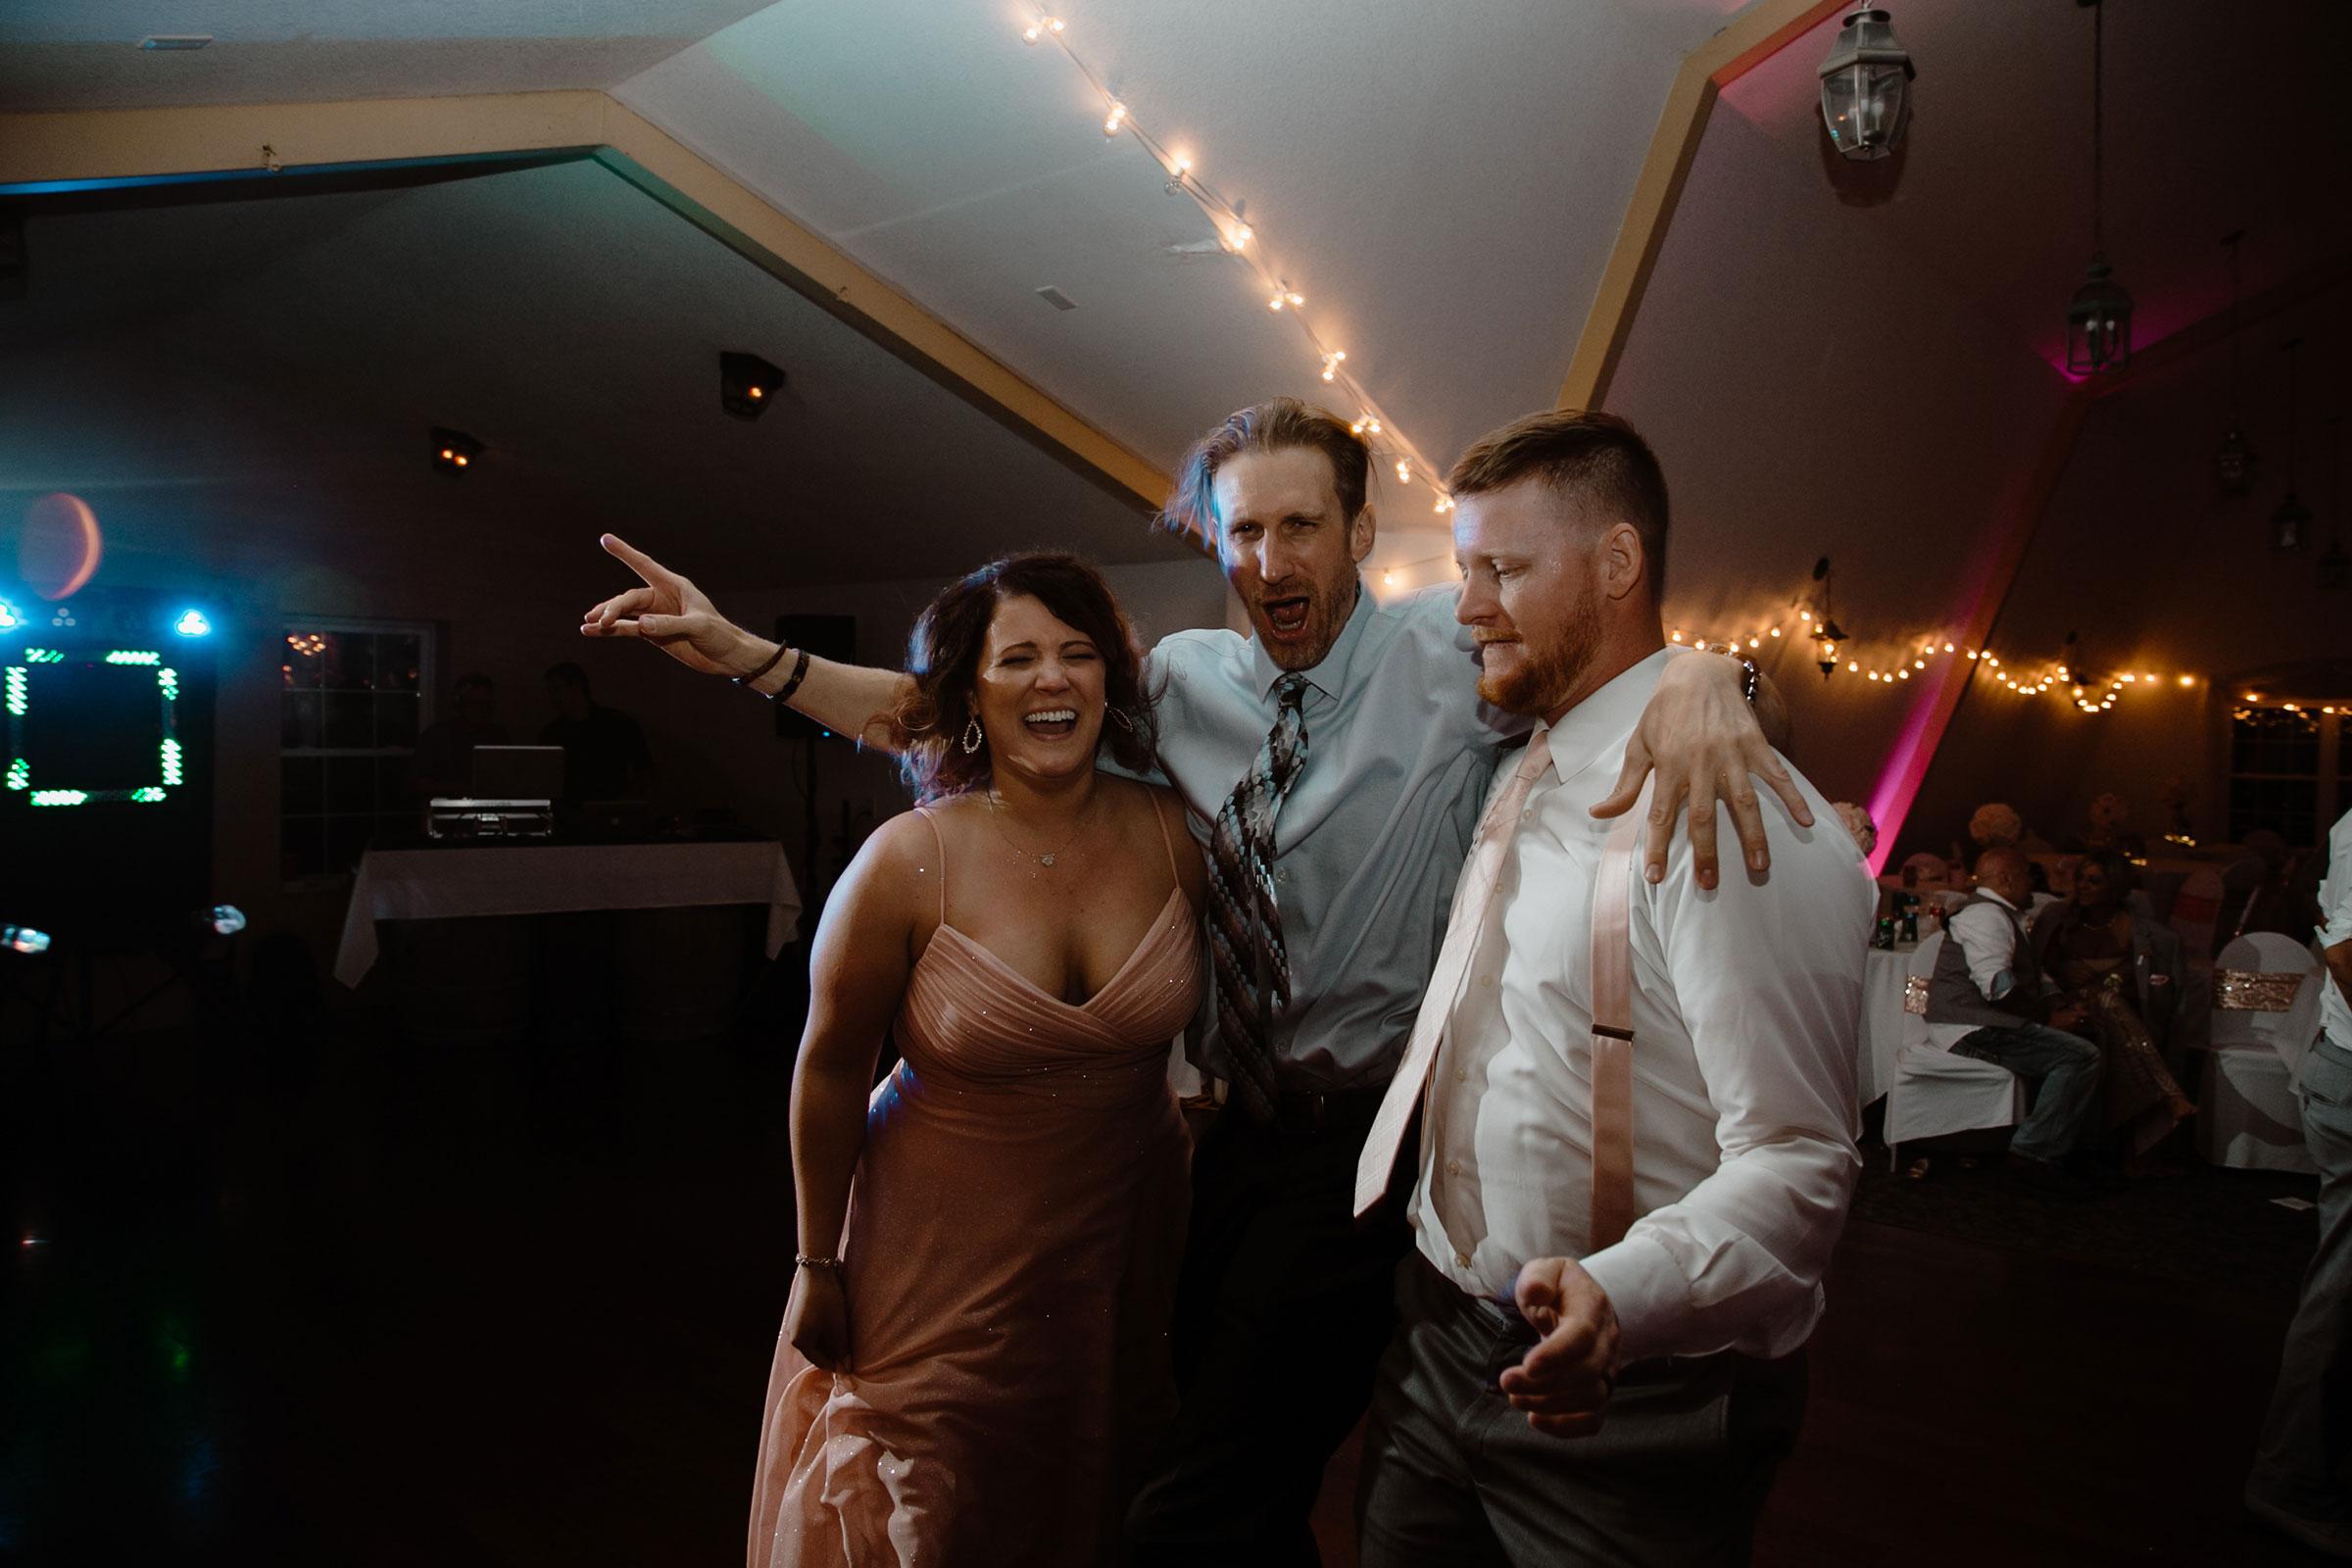 guest-groomesmen-maid-of-honor-dancing-wedding-summerset-winery-indianola-iowa-raelyn-ramey-photography.jpg